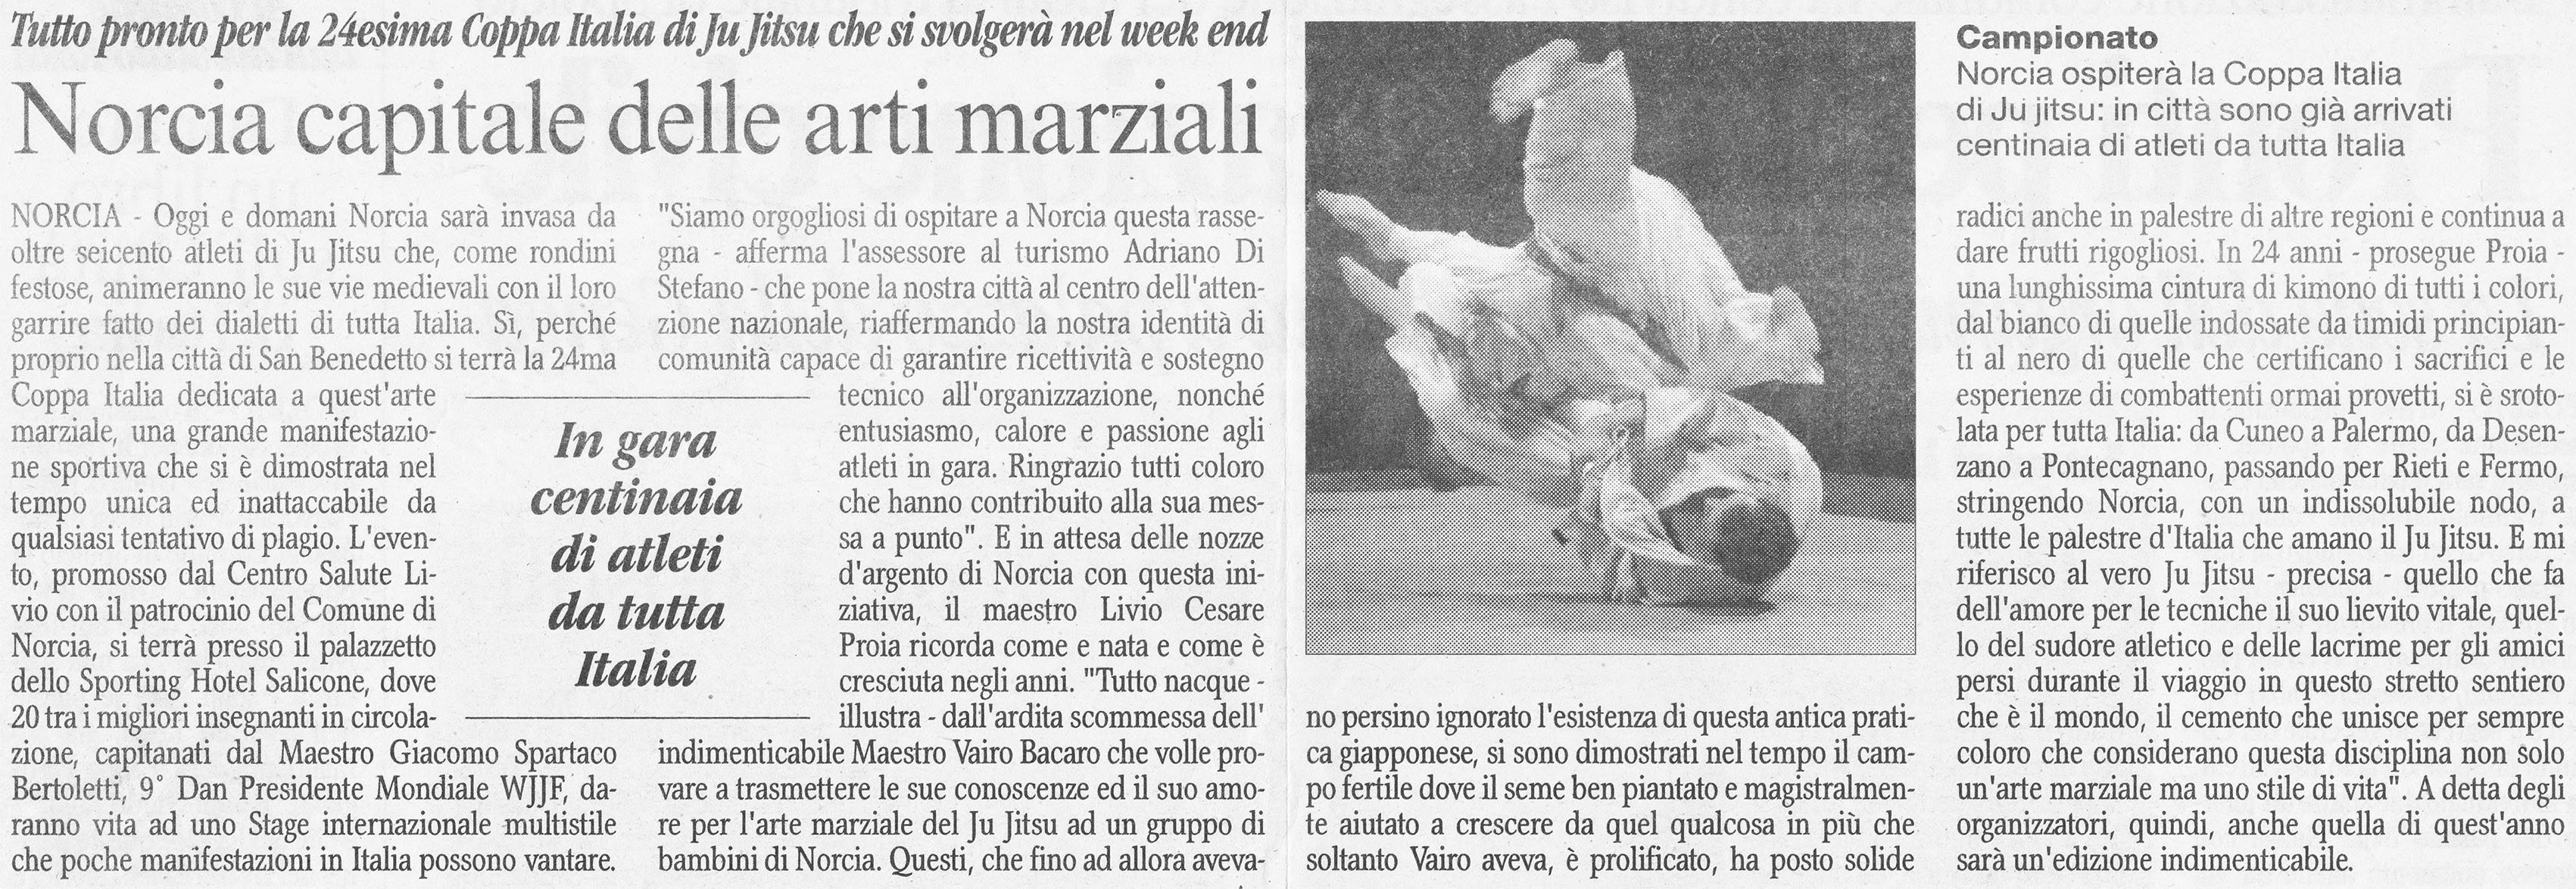 2011 Corriere dell'Umbria